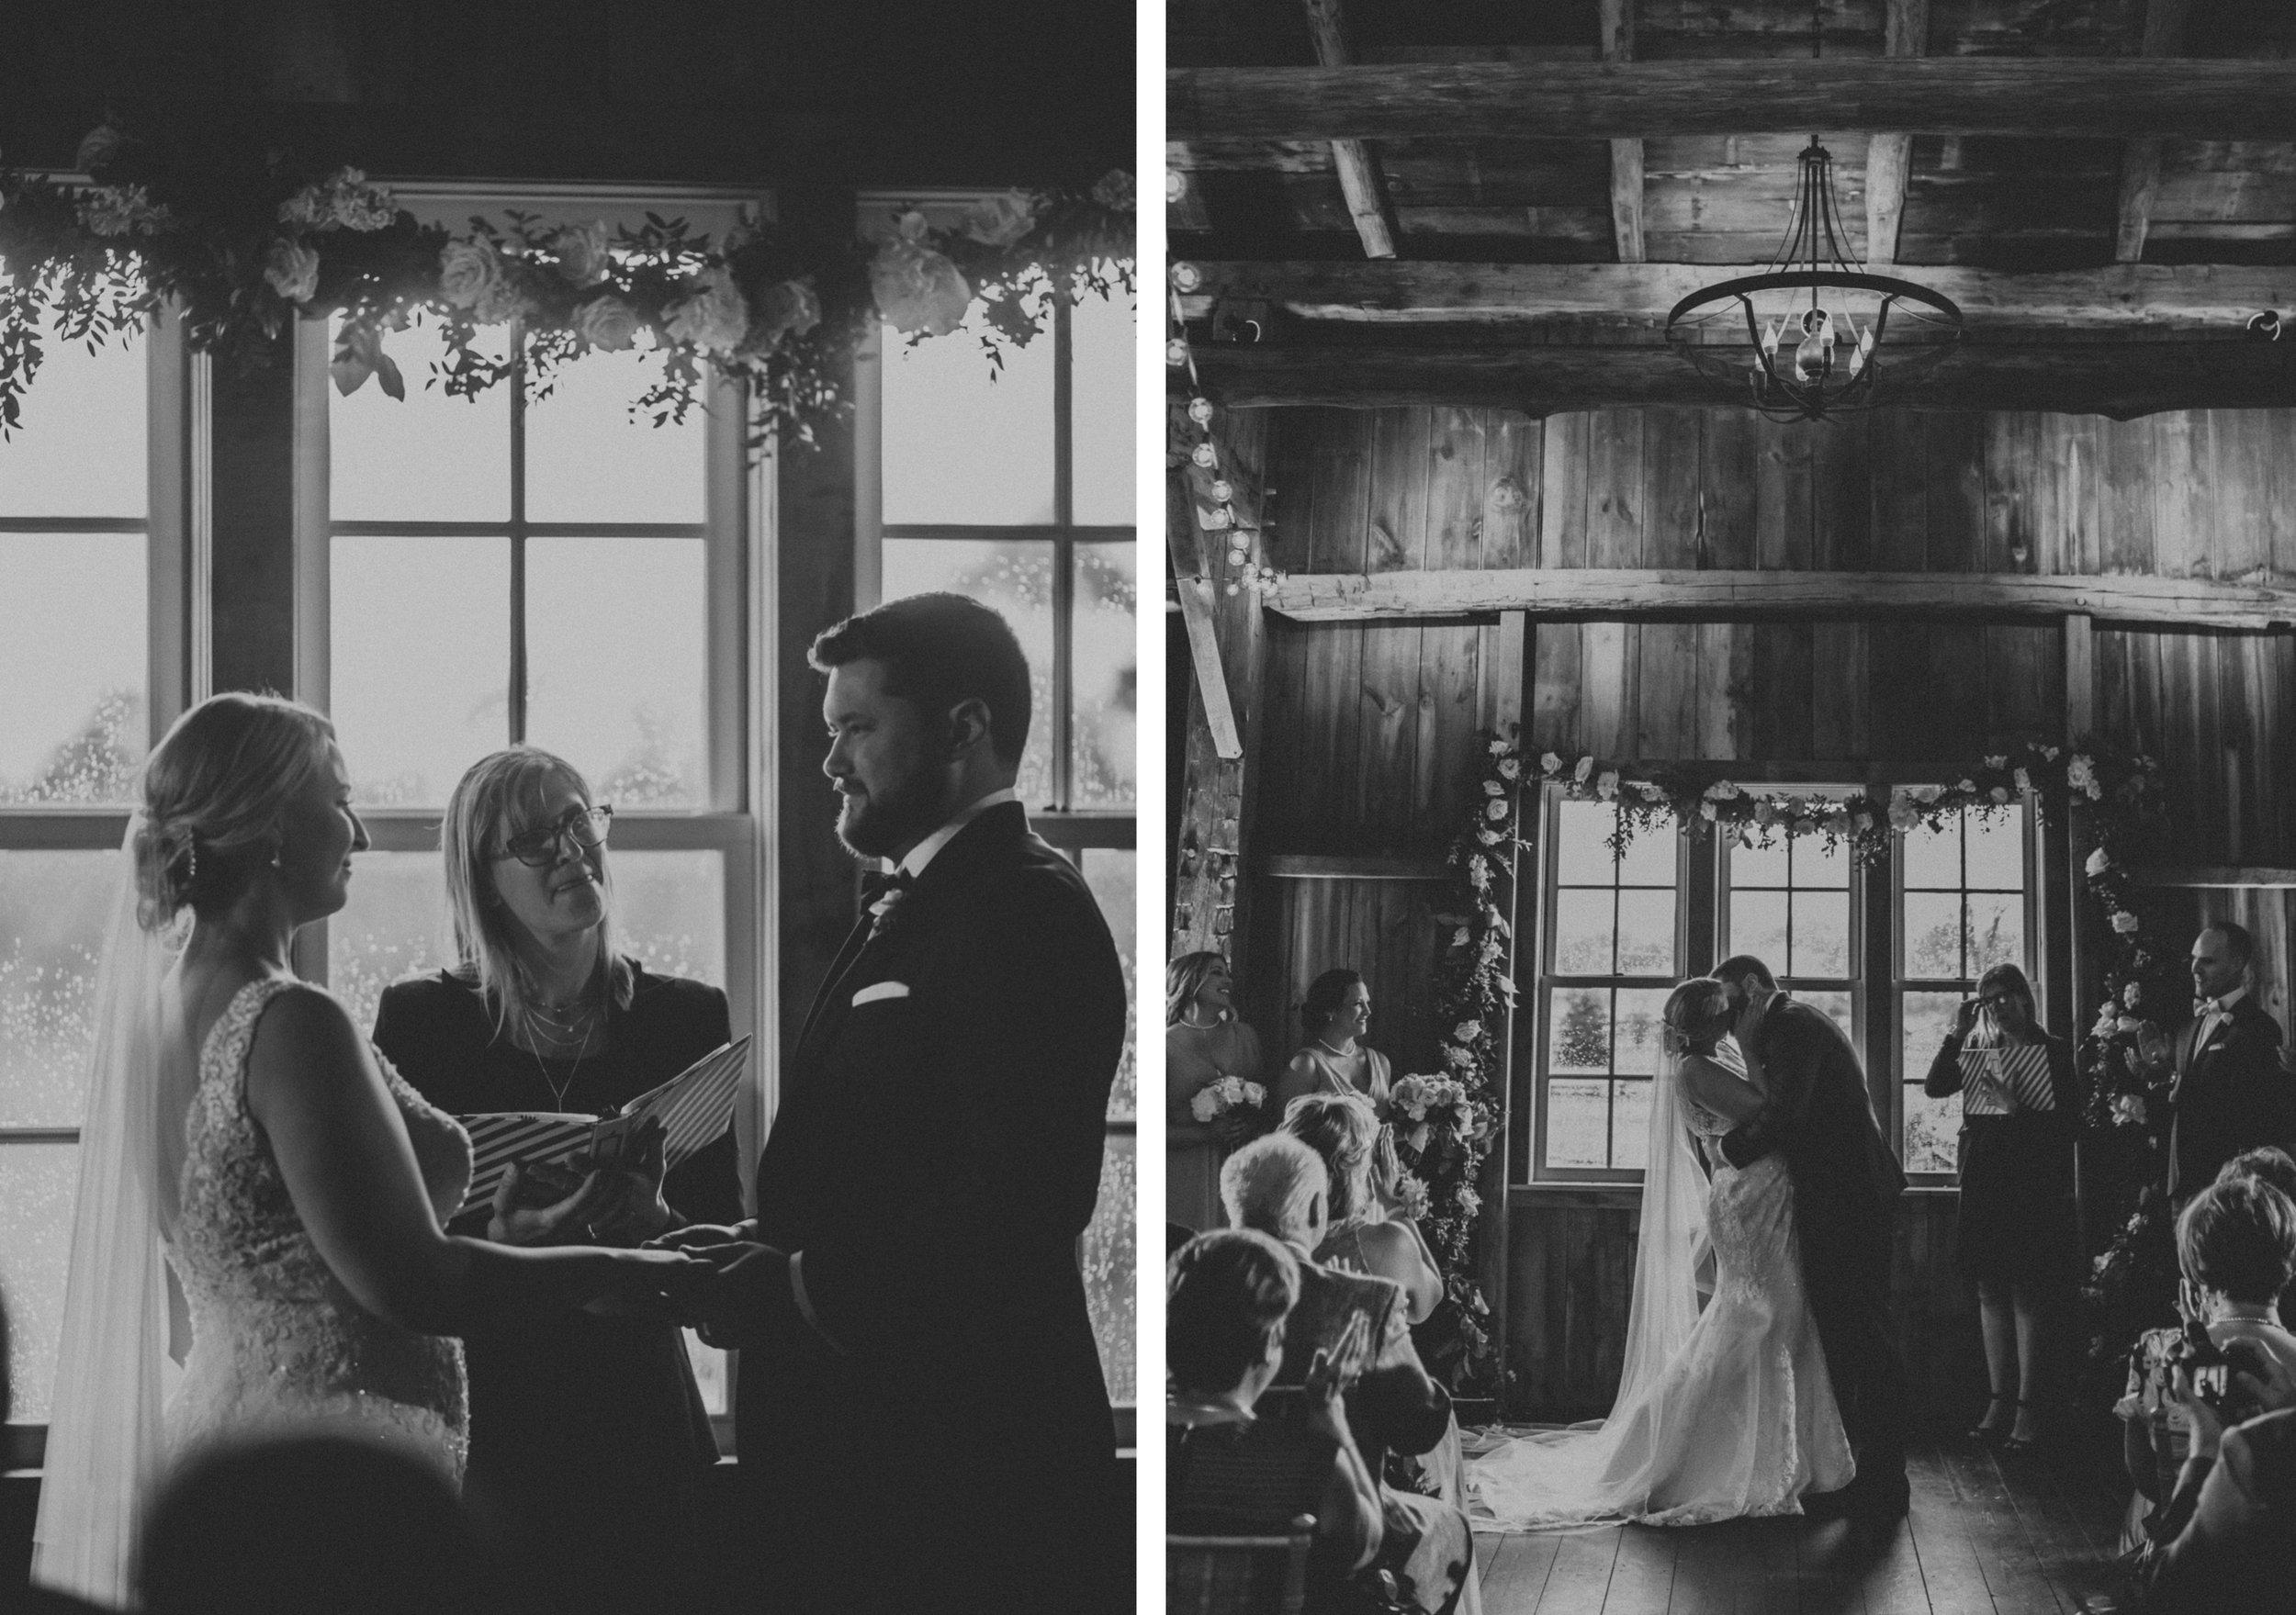 lola-grace-photography-cornman-farms-summer-wedding-45.jpg